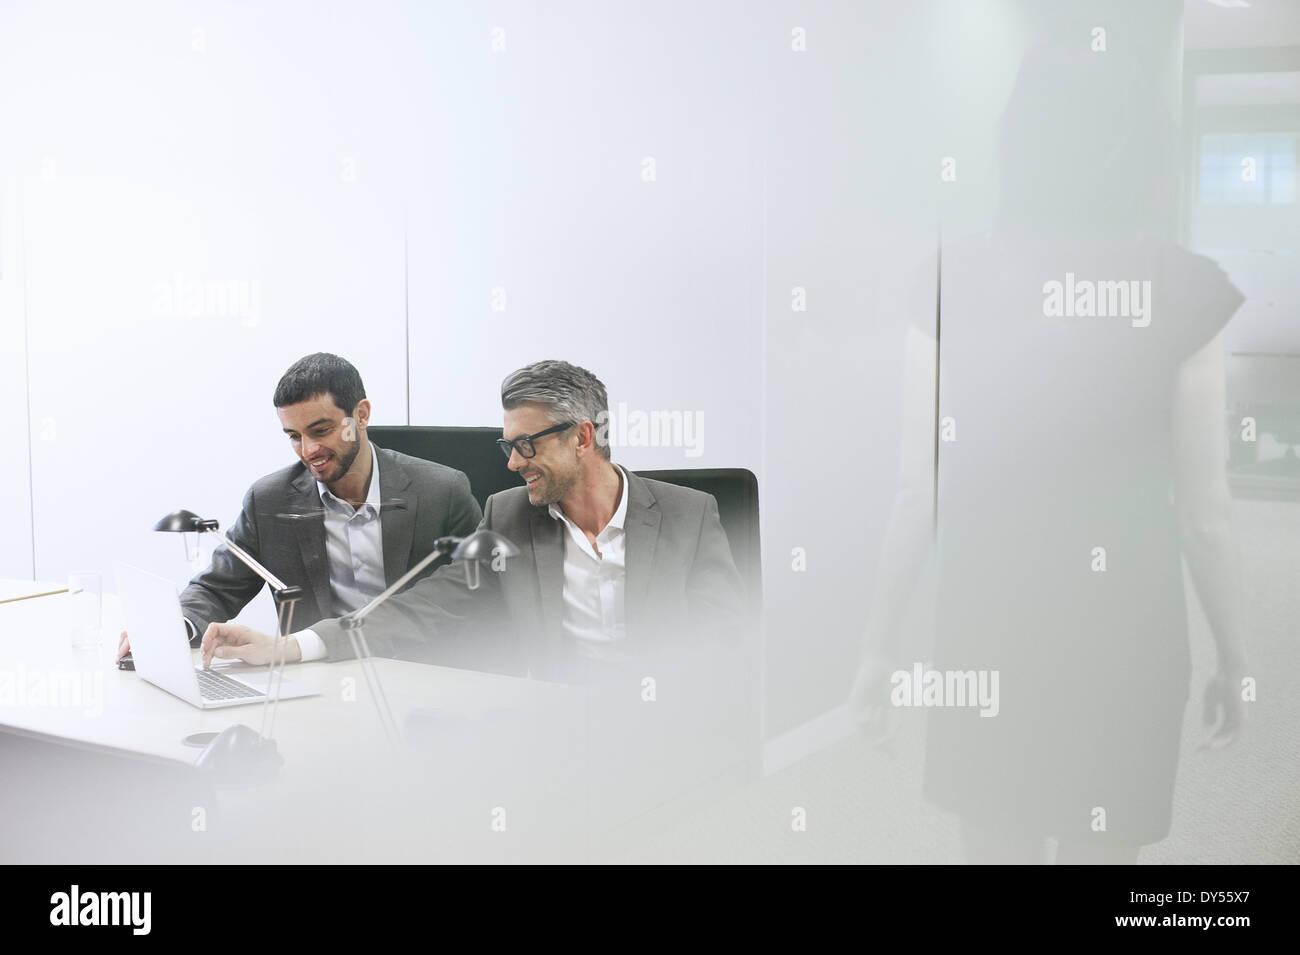 Des collègues masculins using digital tablet in office Banque D'Images